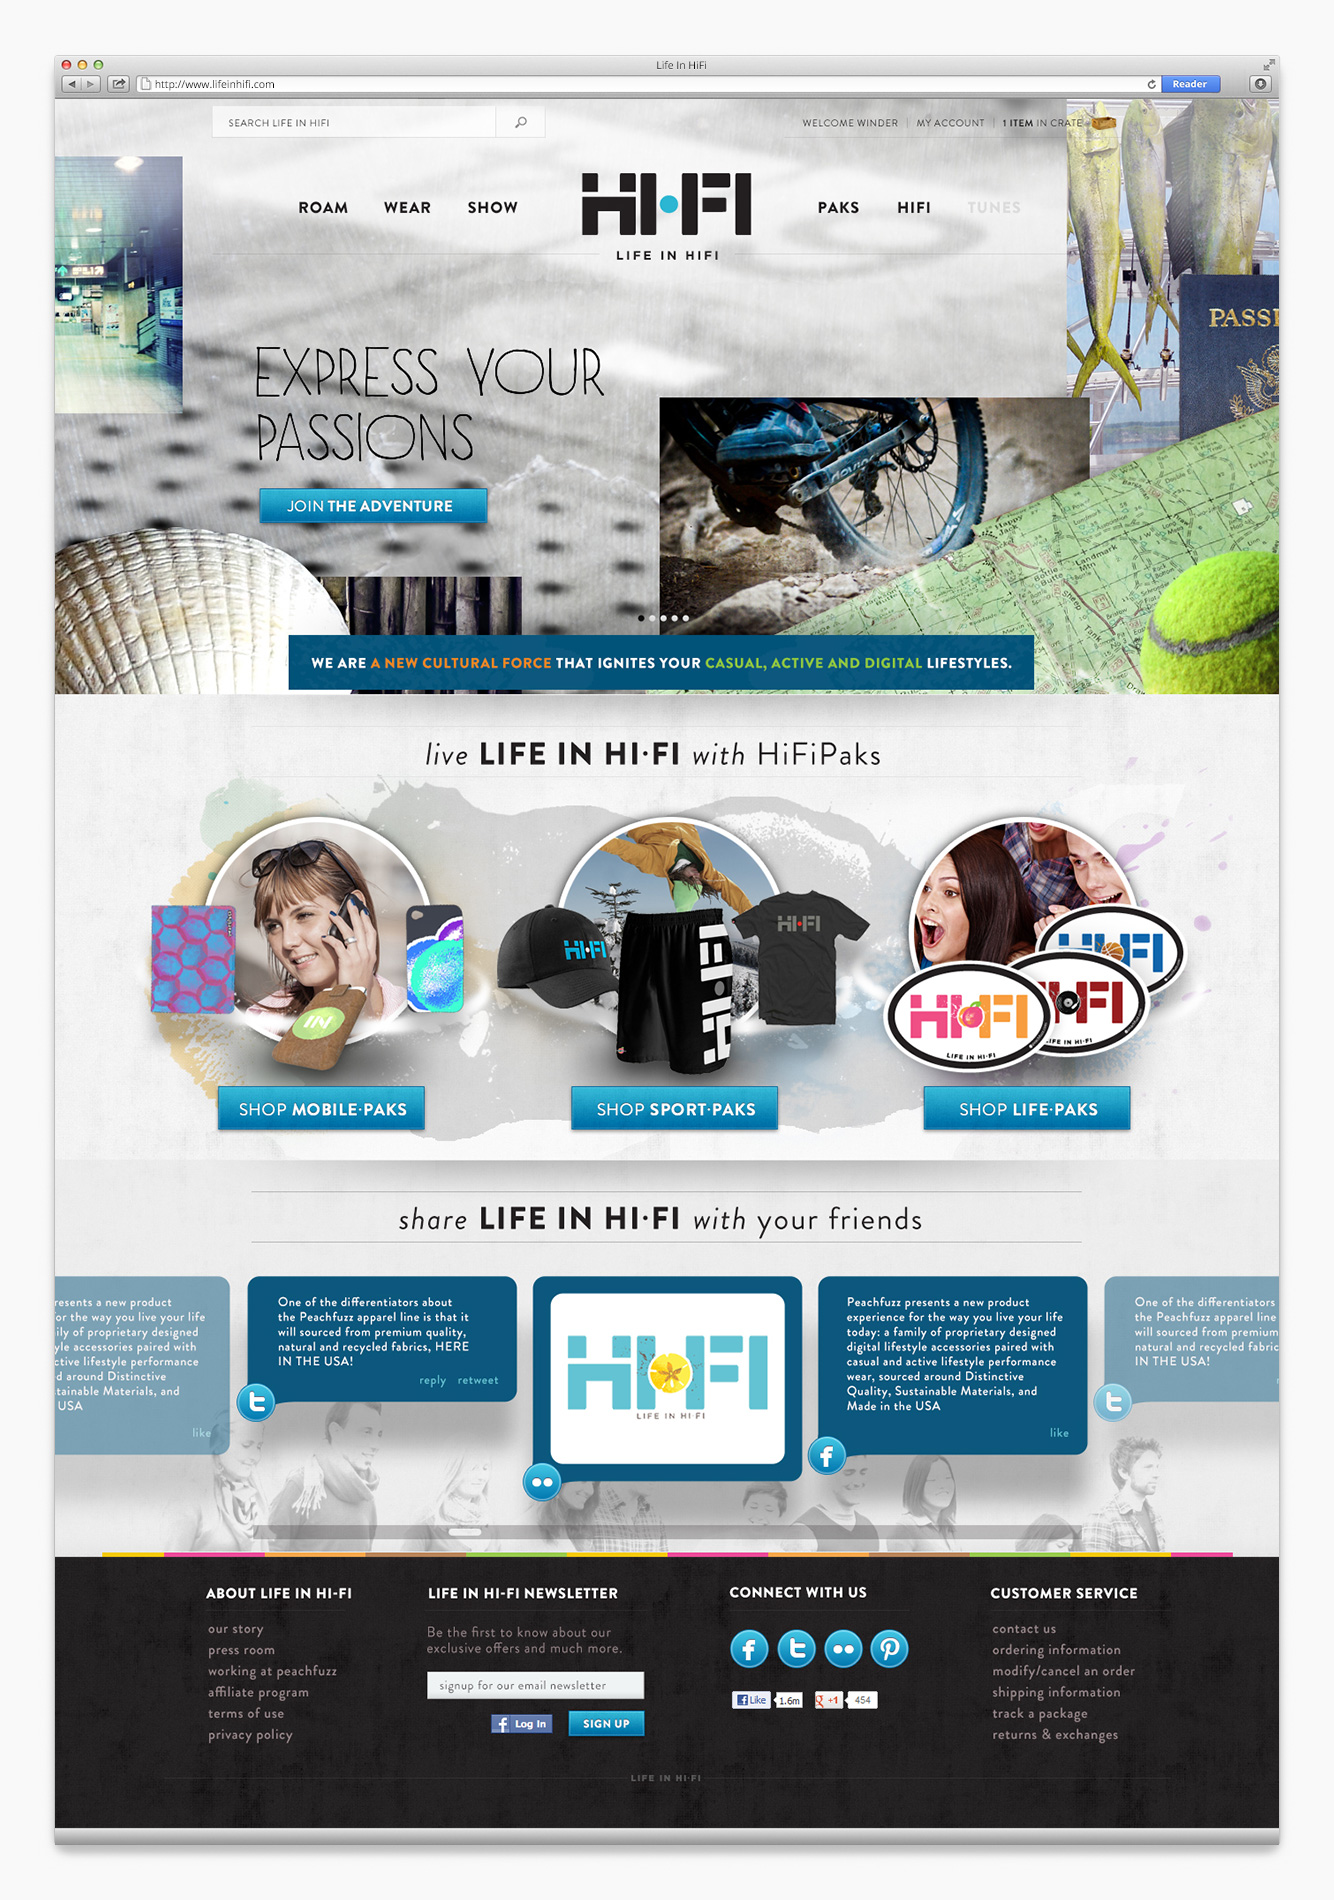 interactive_lifeinhifi_image24